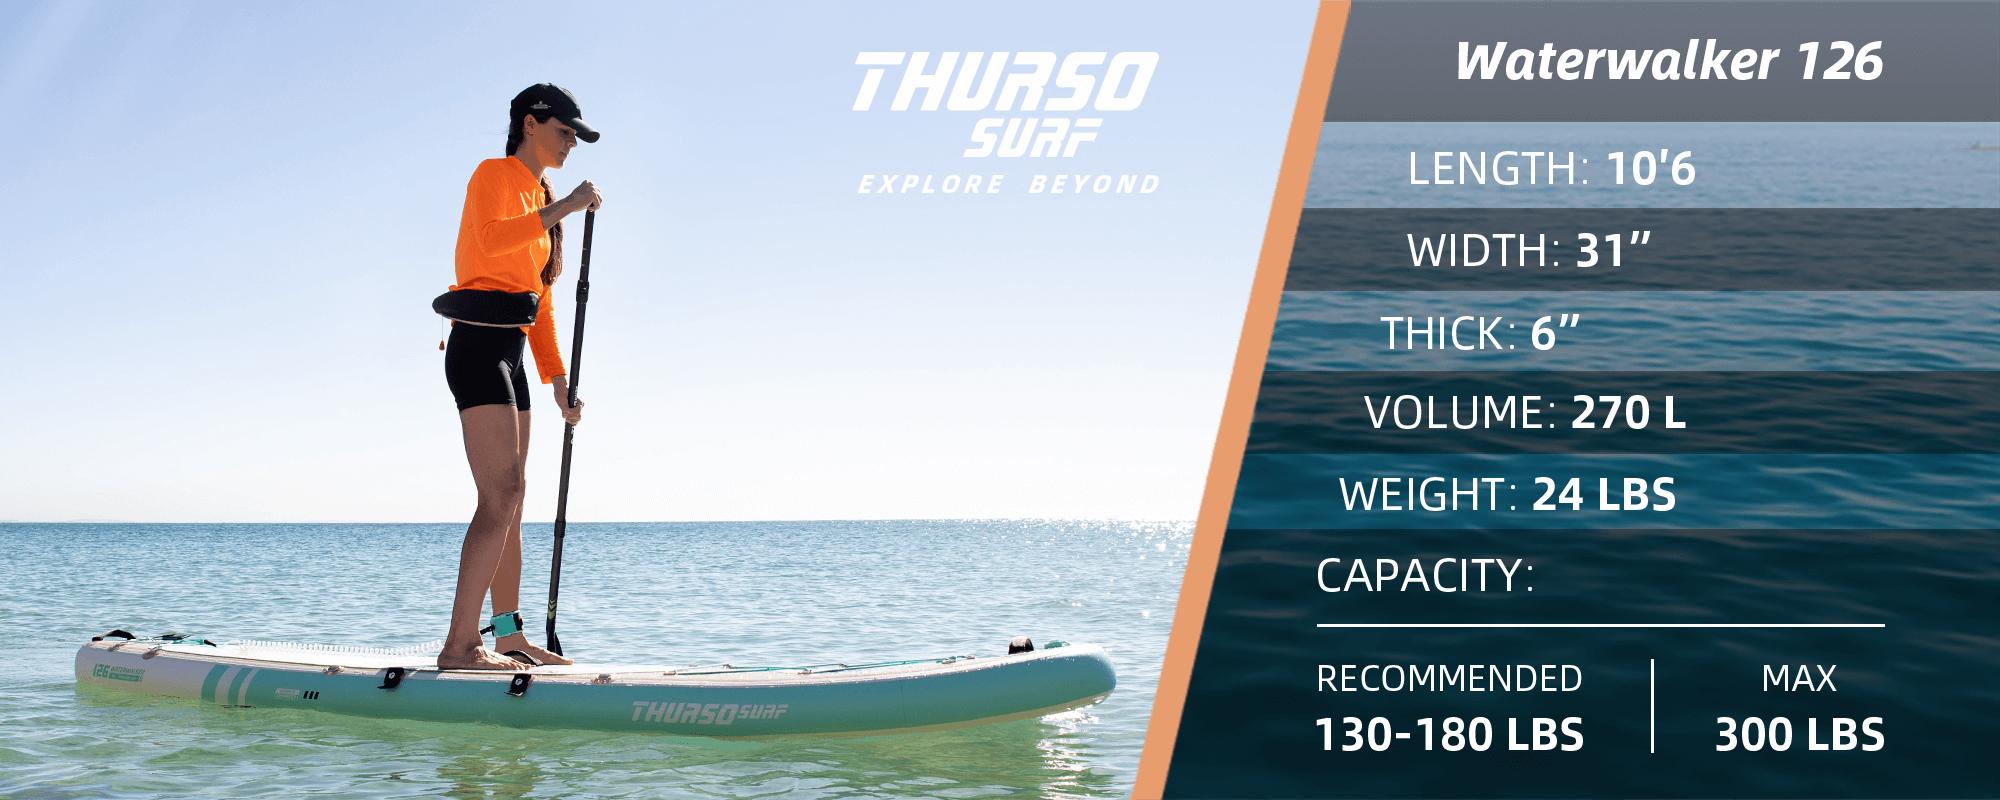 Thurso-Surf-Waterwalker-126-2021-specs